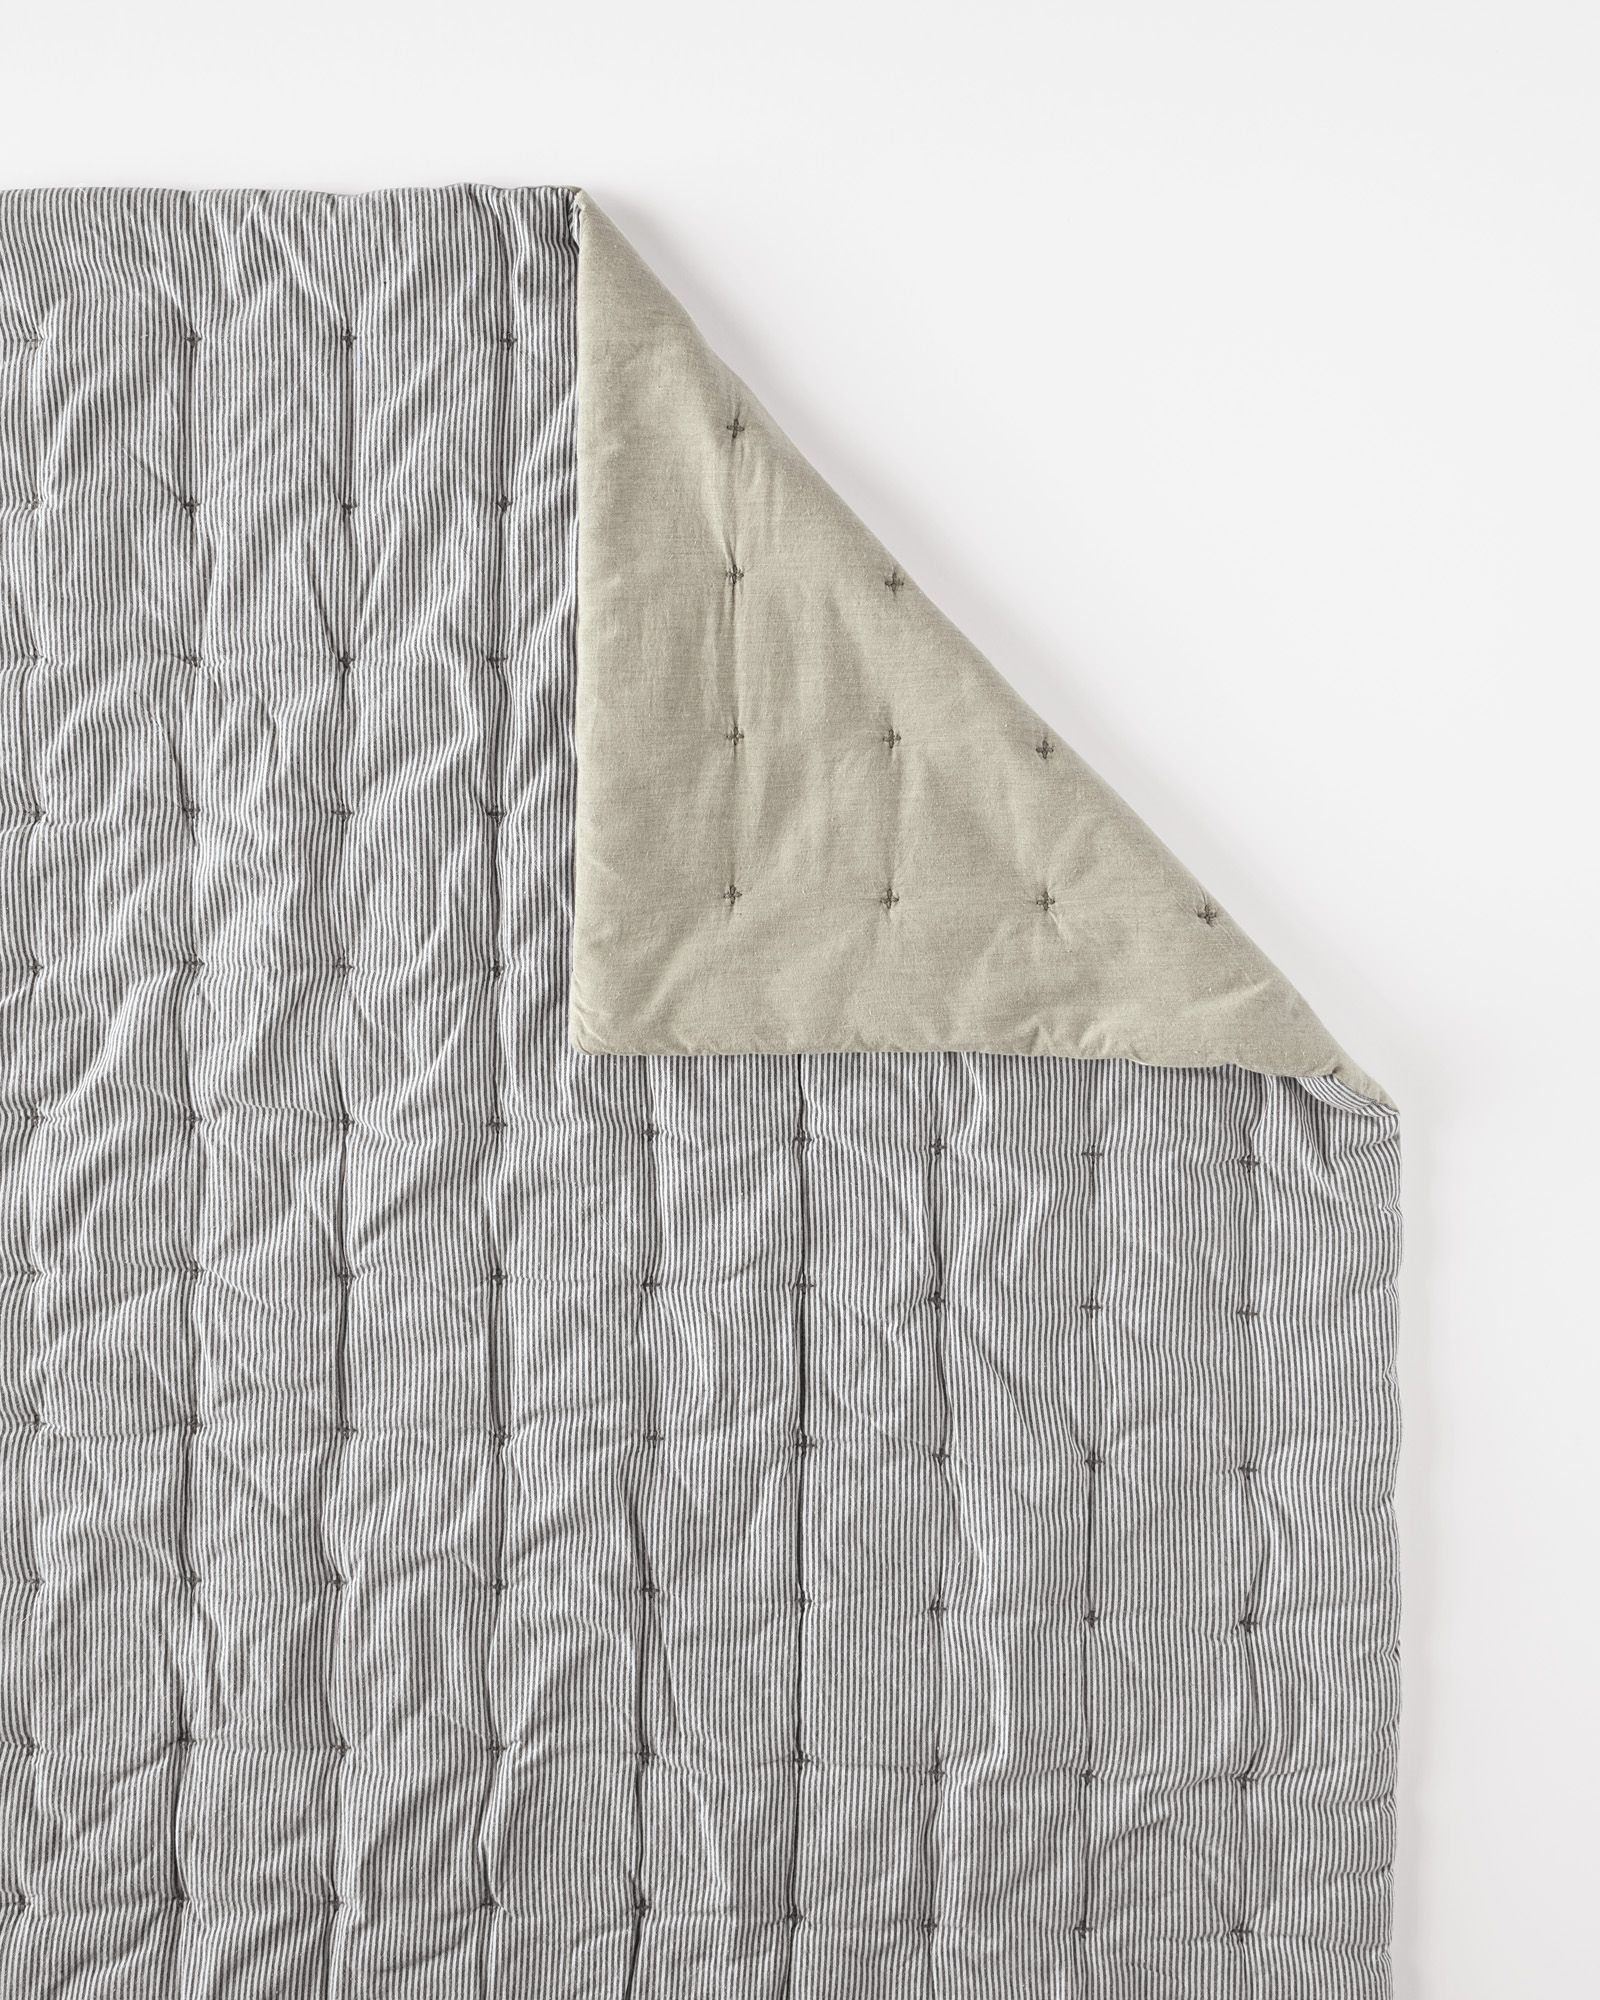 Woven Stripe QuiltWoven Stripe Quilt | HOME: bedroom | Pinterest ... : ticking quilt - Adamdwight.com